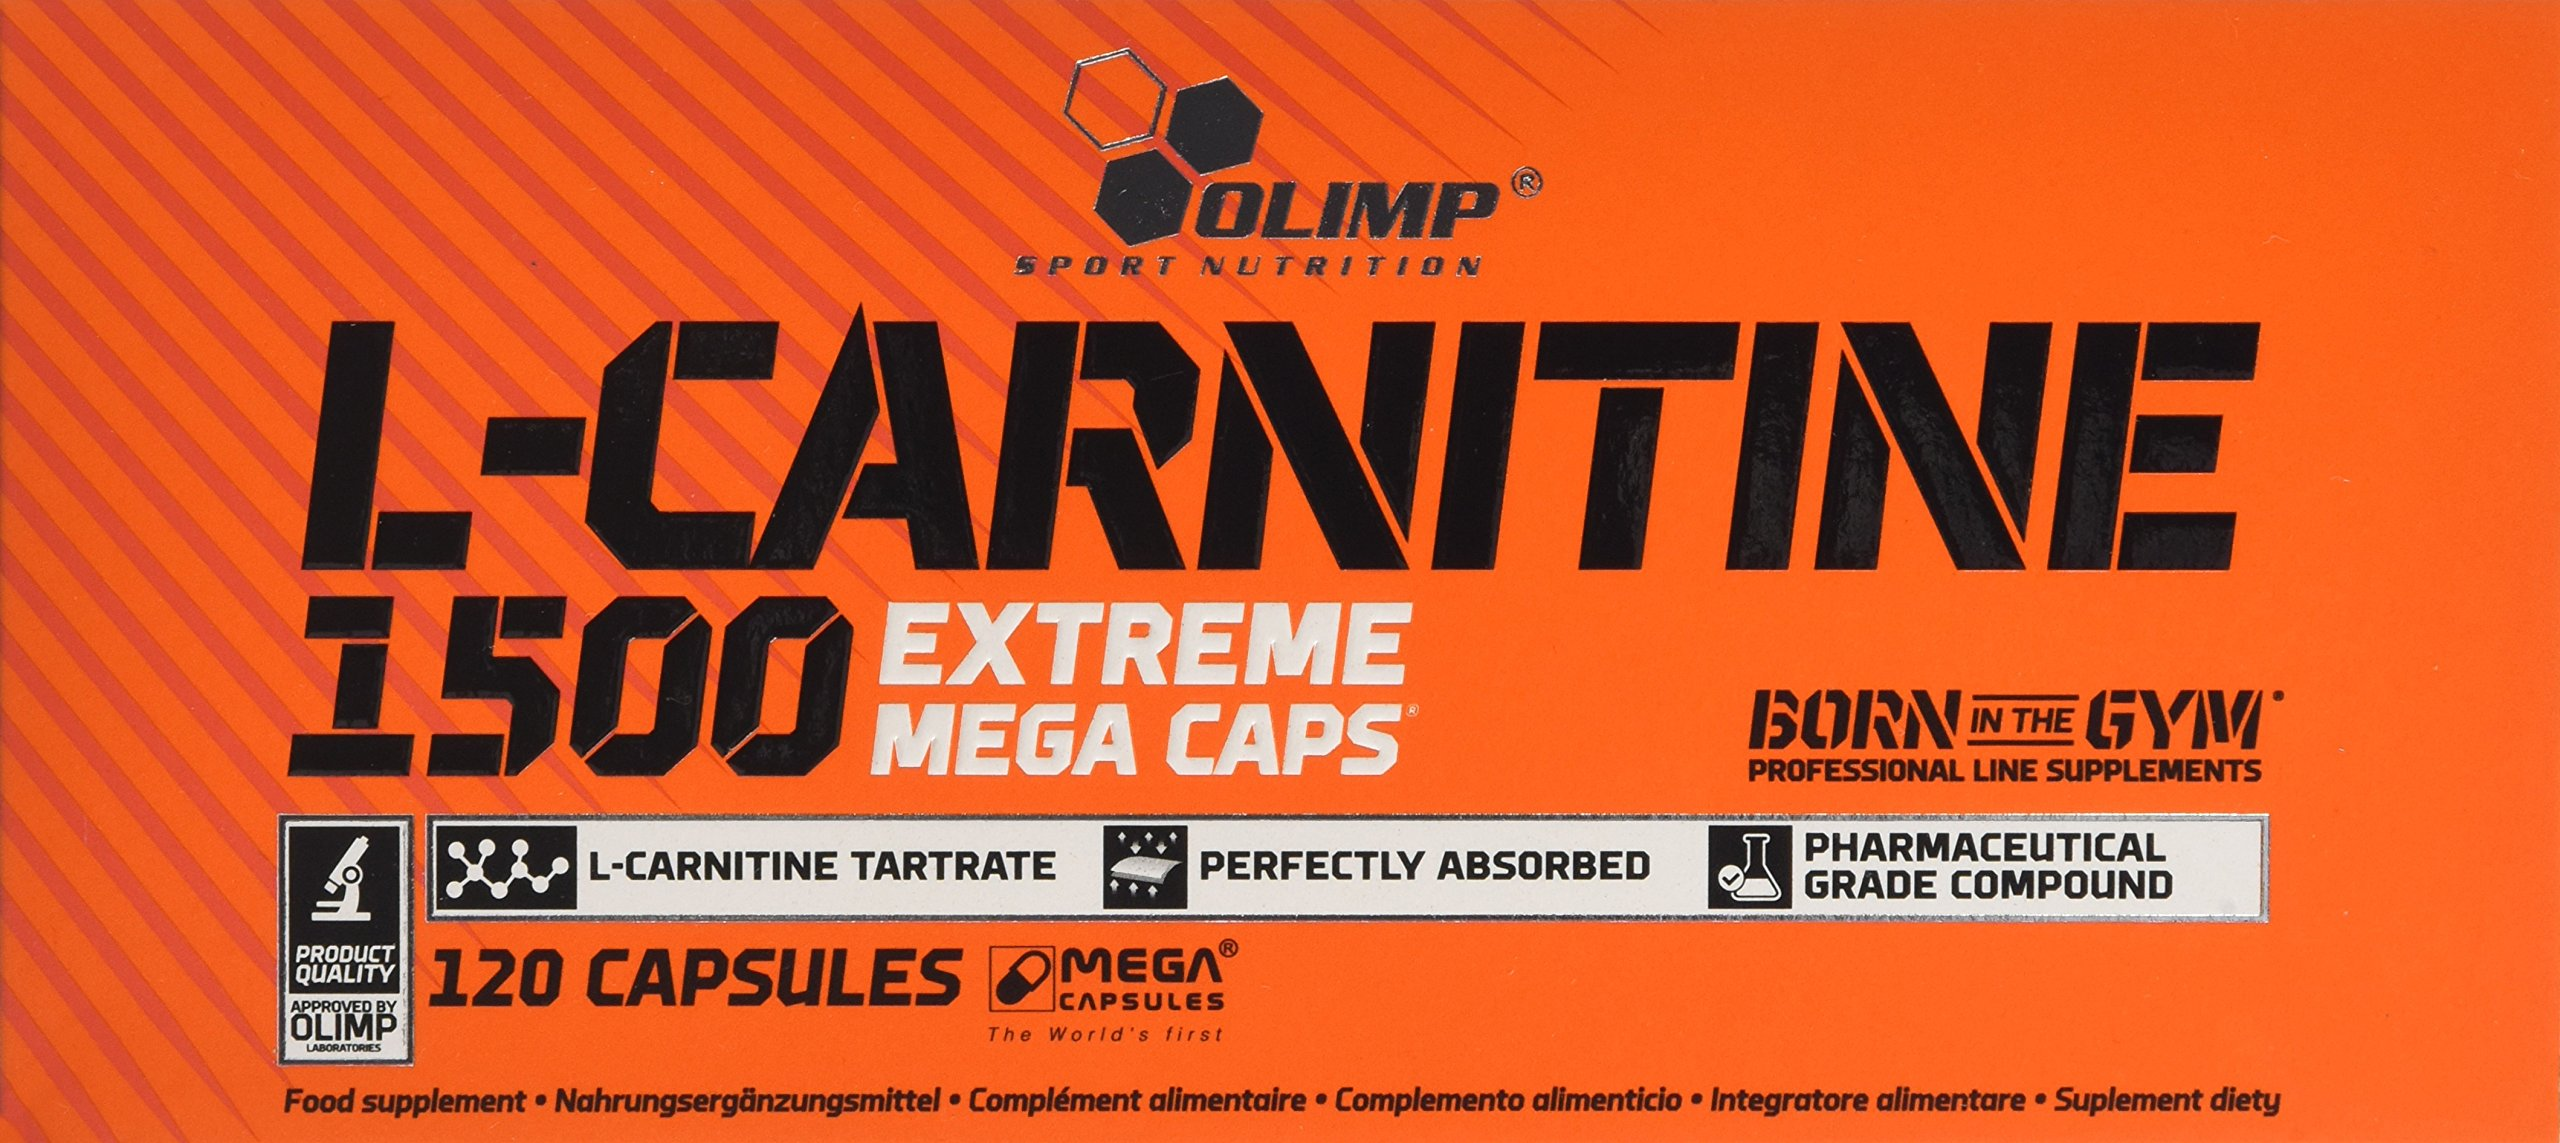 Olimp L-Carnitine 1500 Extreme Mega Capsules – Pack of 120 Capsules